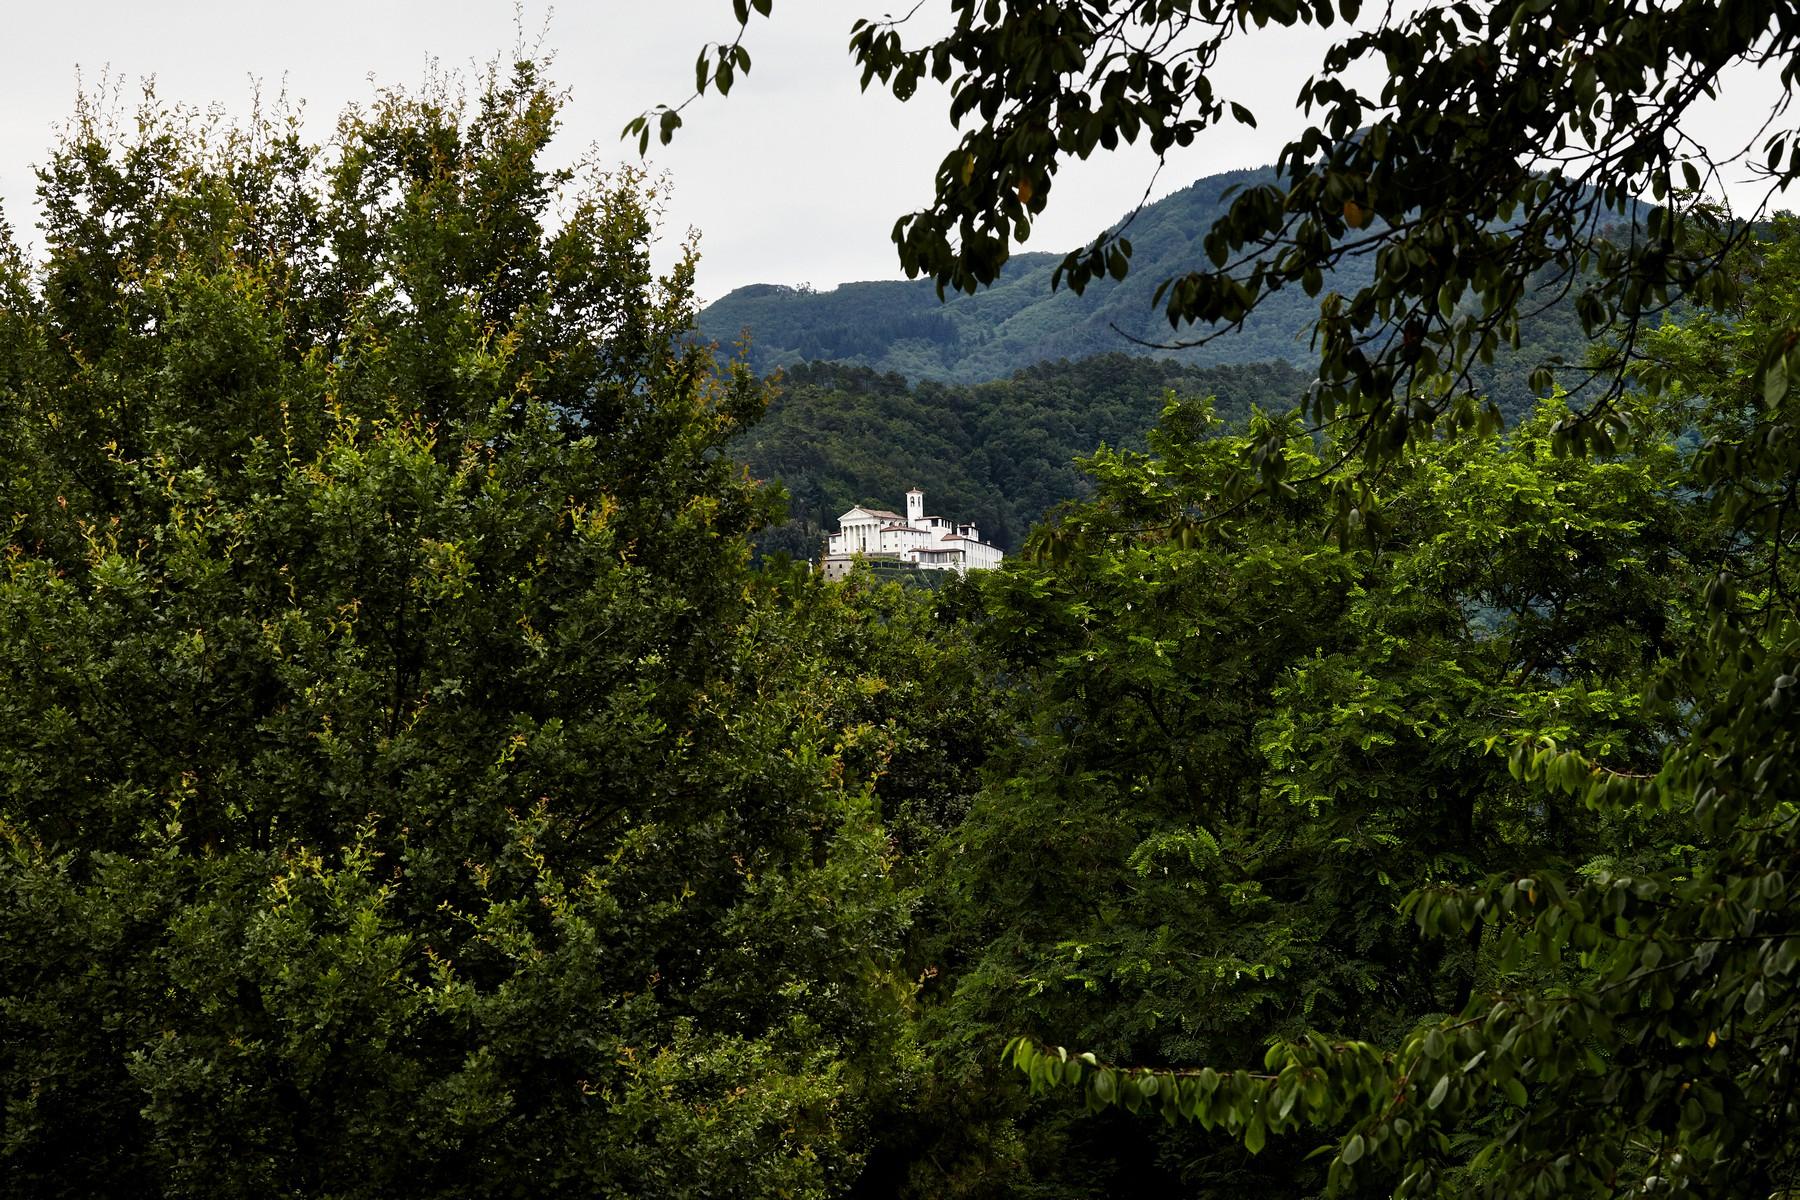 Villa in Vendita a Lucca: 5 locali, 2500 mq - Foto 23